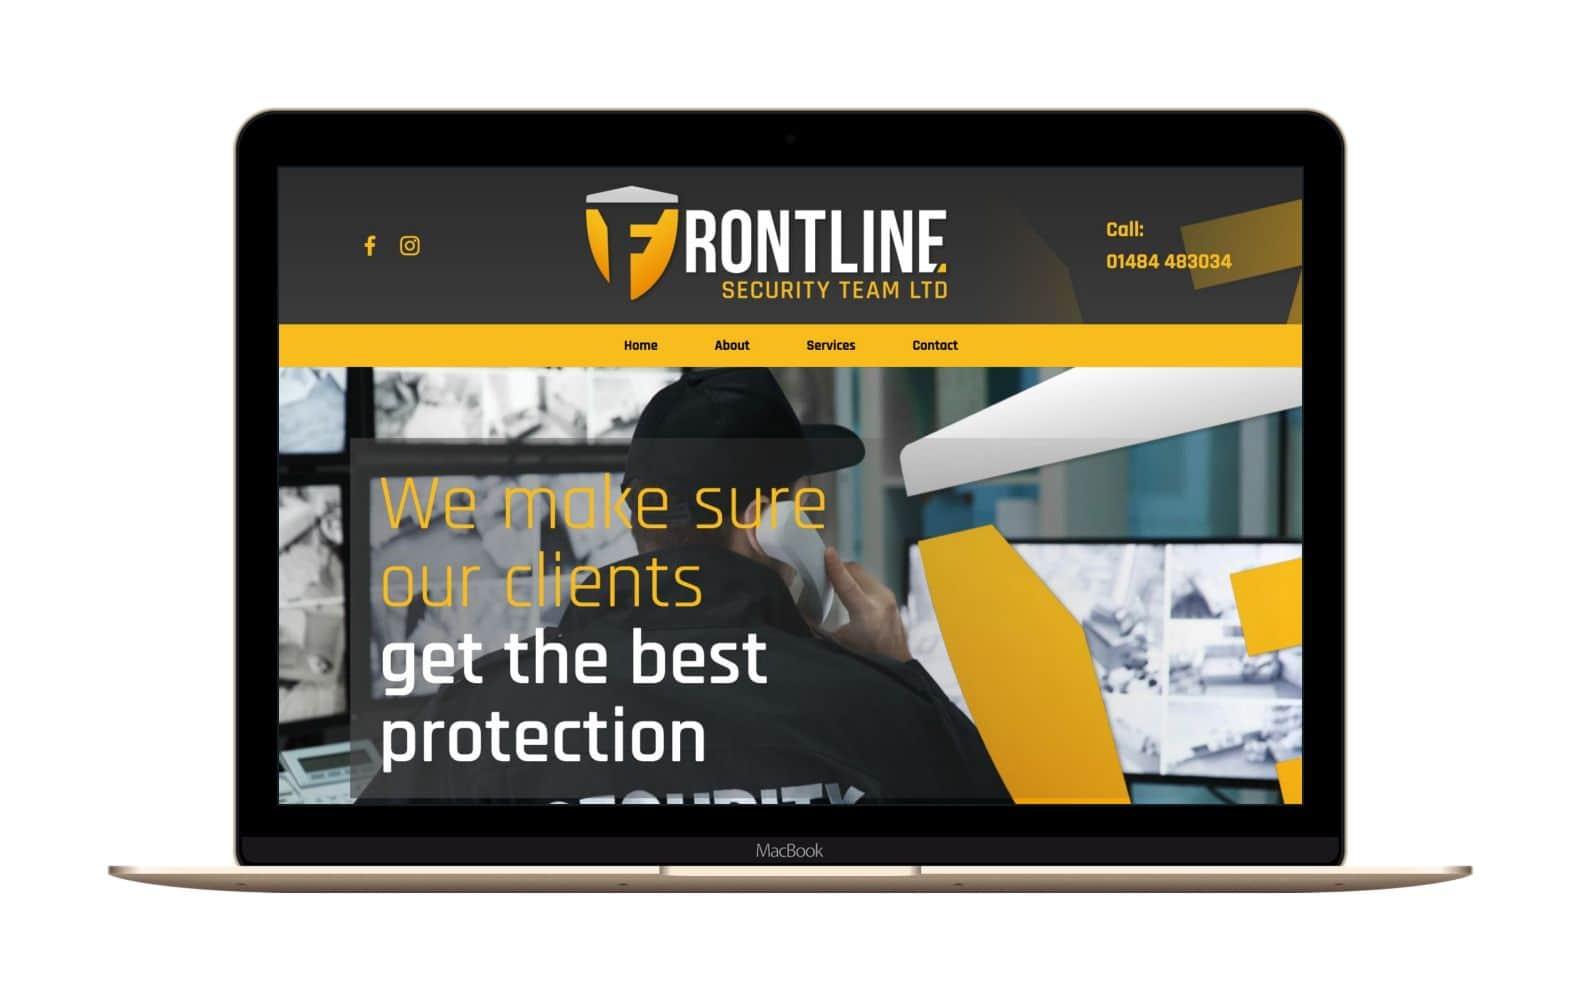 Website Design for Frontline Security